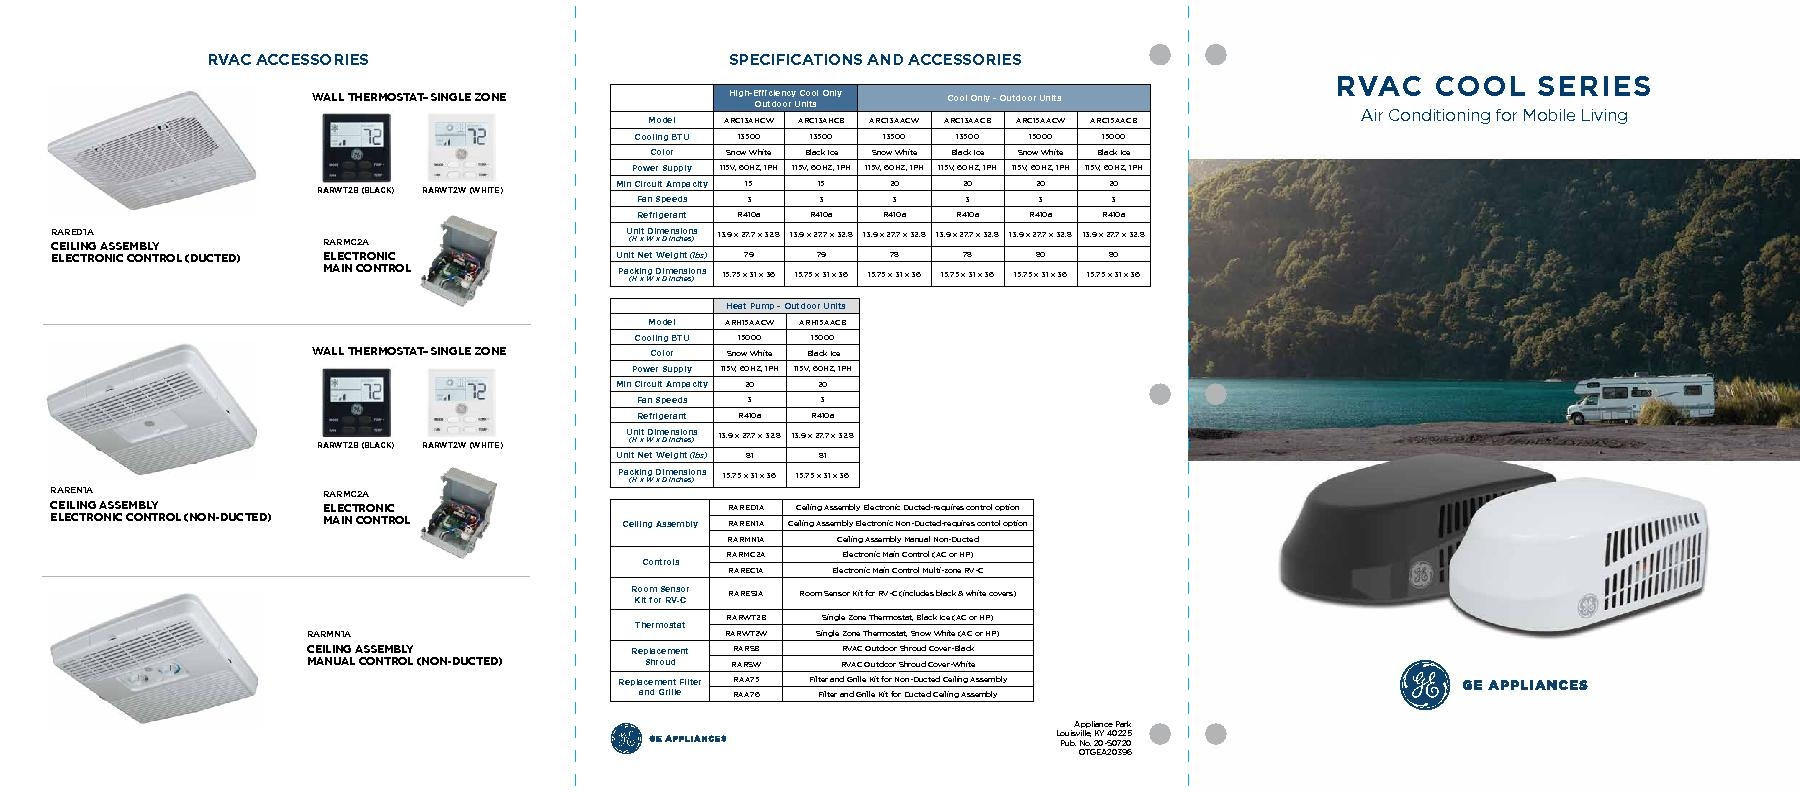 GE Appliances RVAC Cool Series Brochure